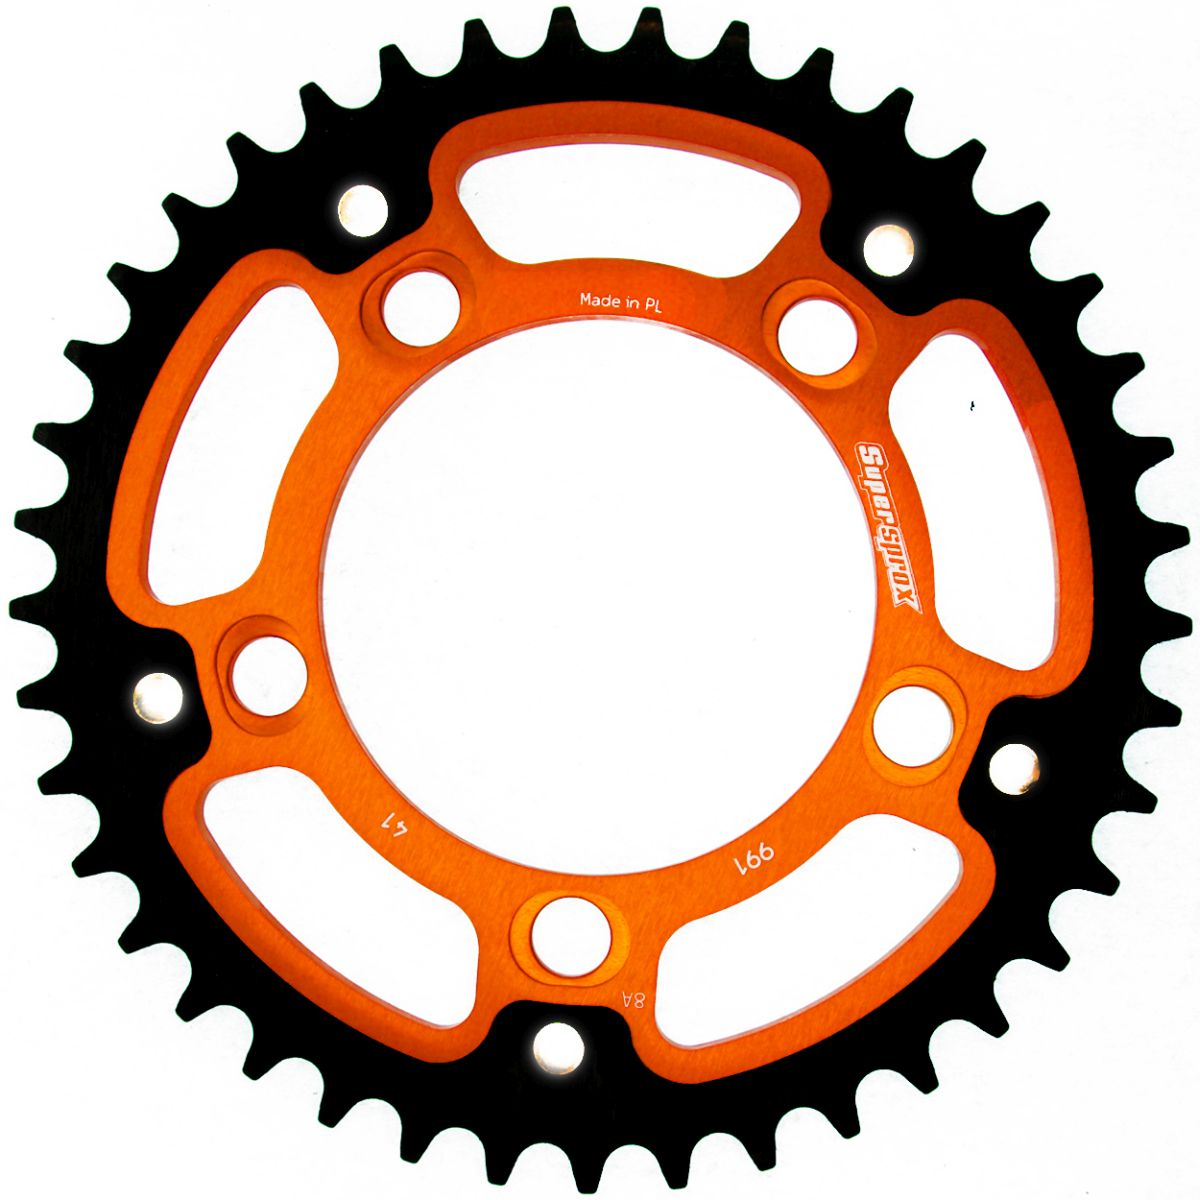 rear sprocket stealth orange 38t 525 motorcycles ktm 990 KTM Super Duke Custom rear sprocket rst 991 41 stealth orange 41t 525